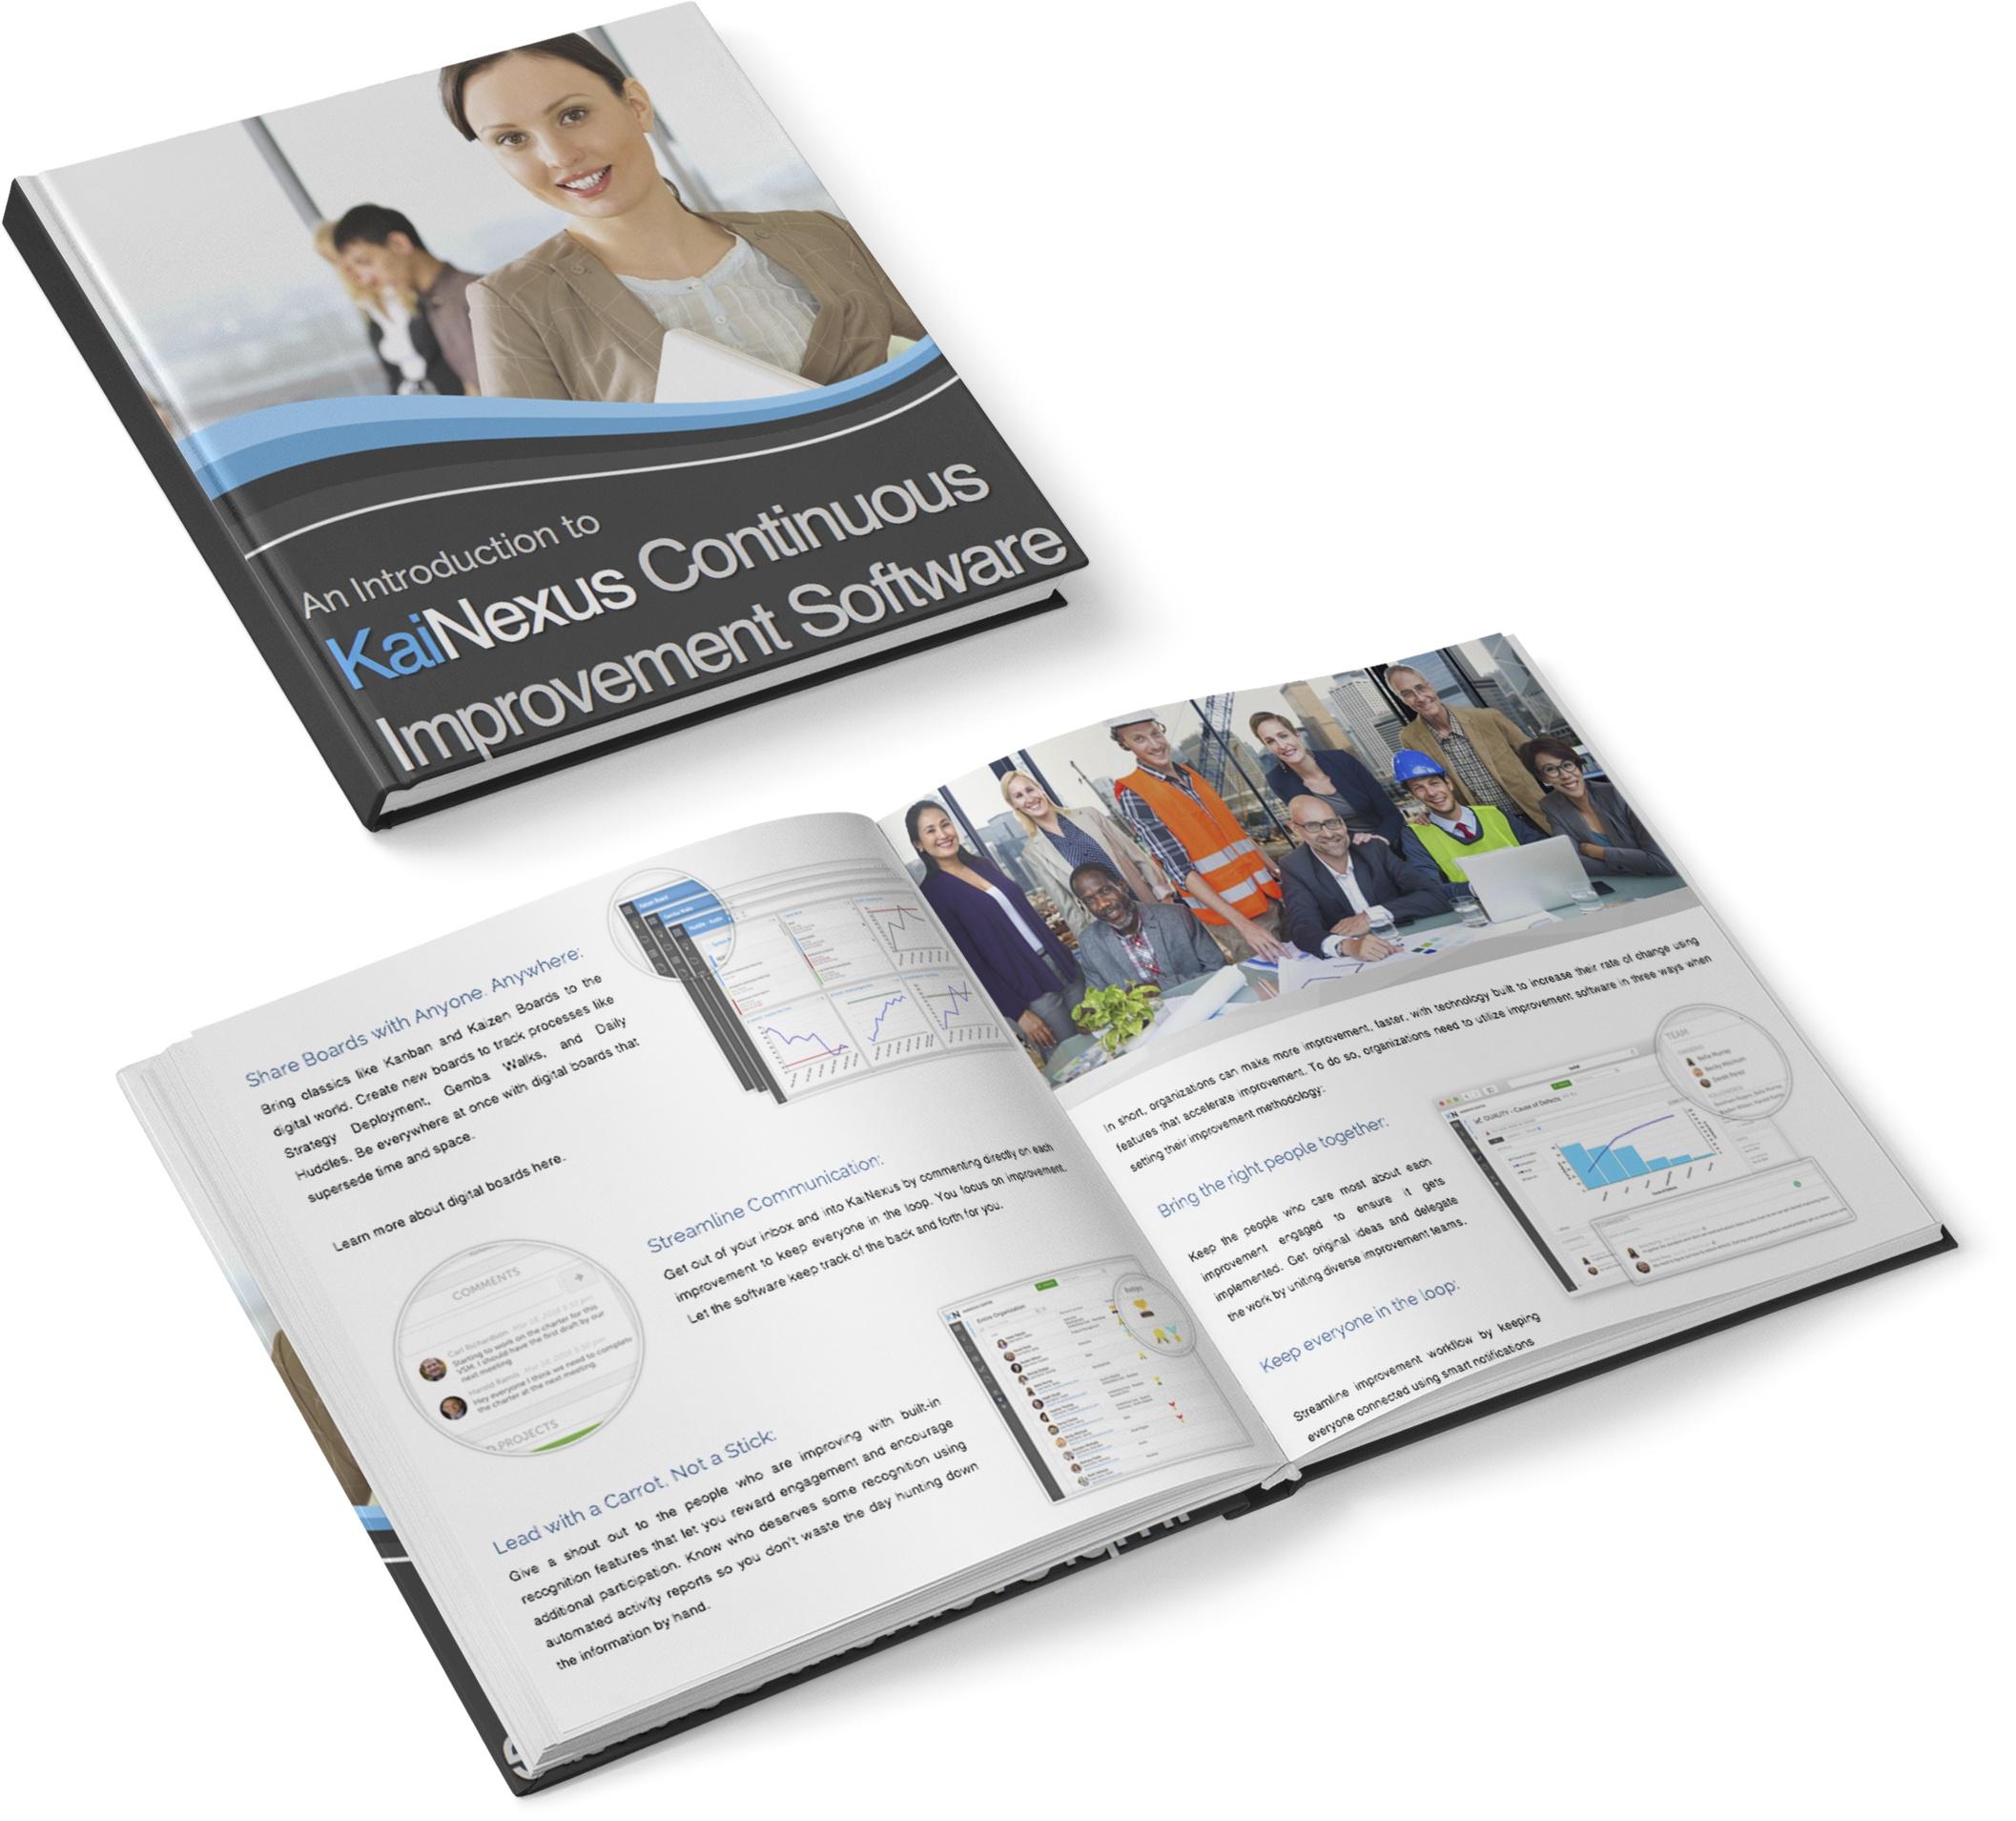 Continuous Improvement Software eBook